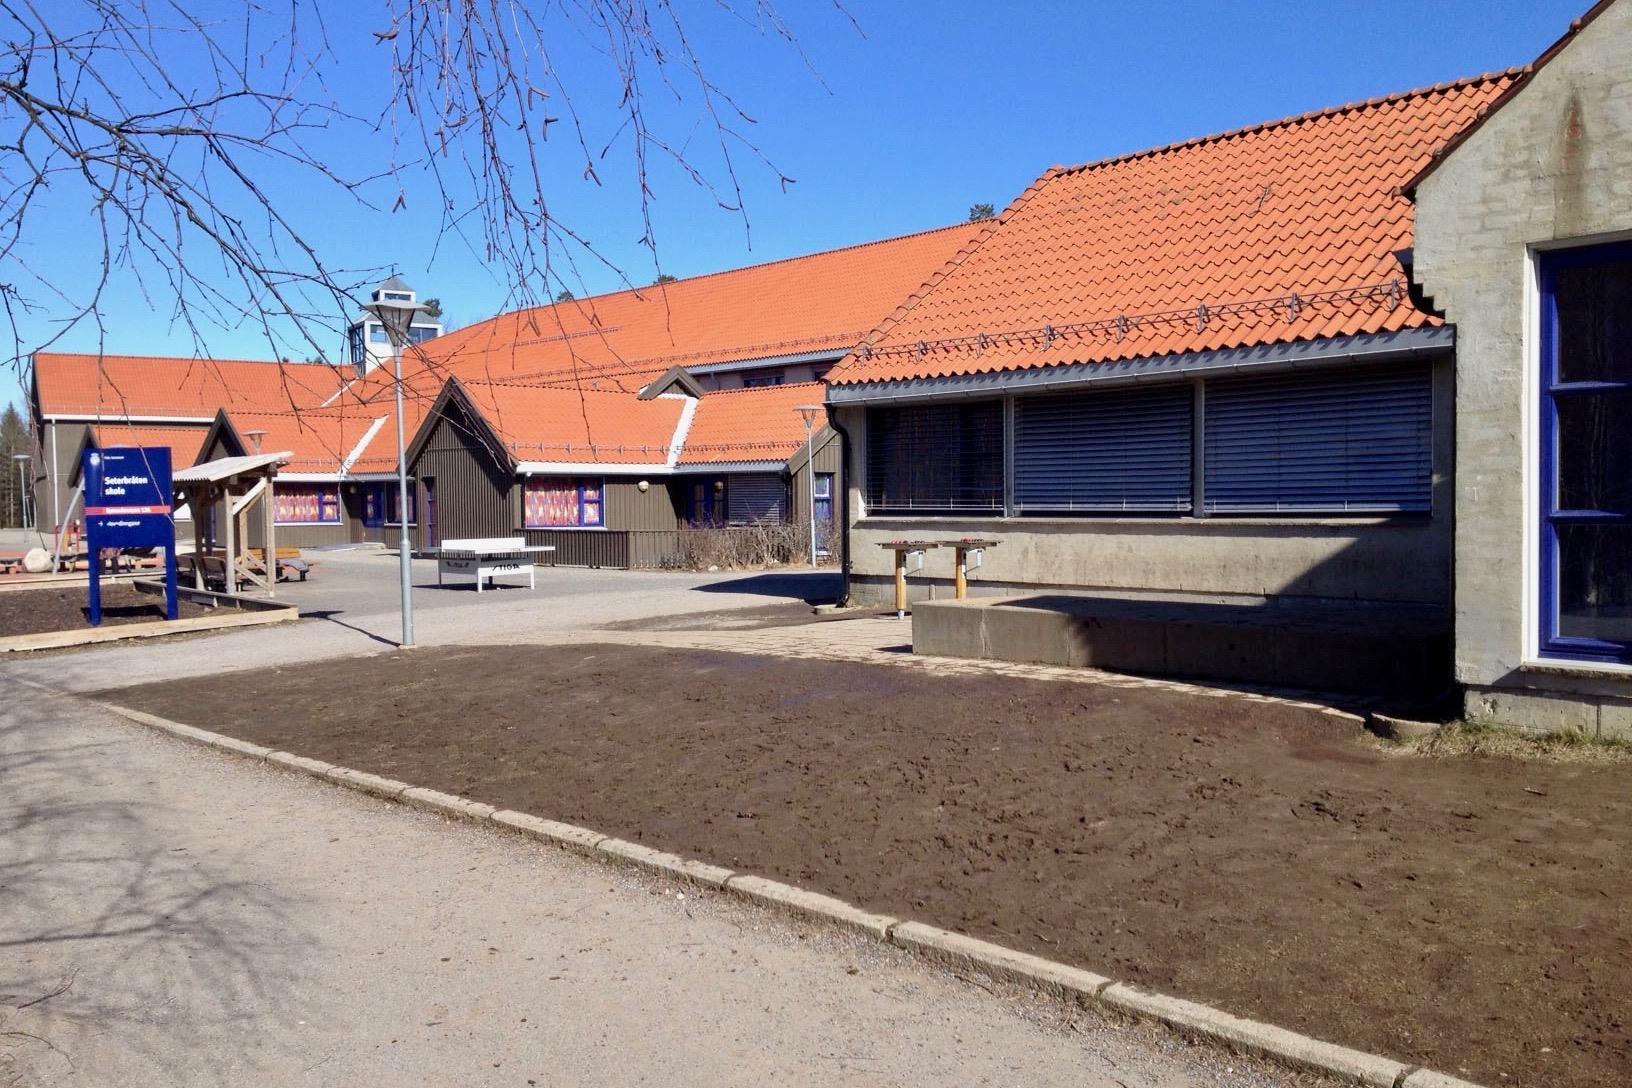 Beskyttet: Seterbråten skole